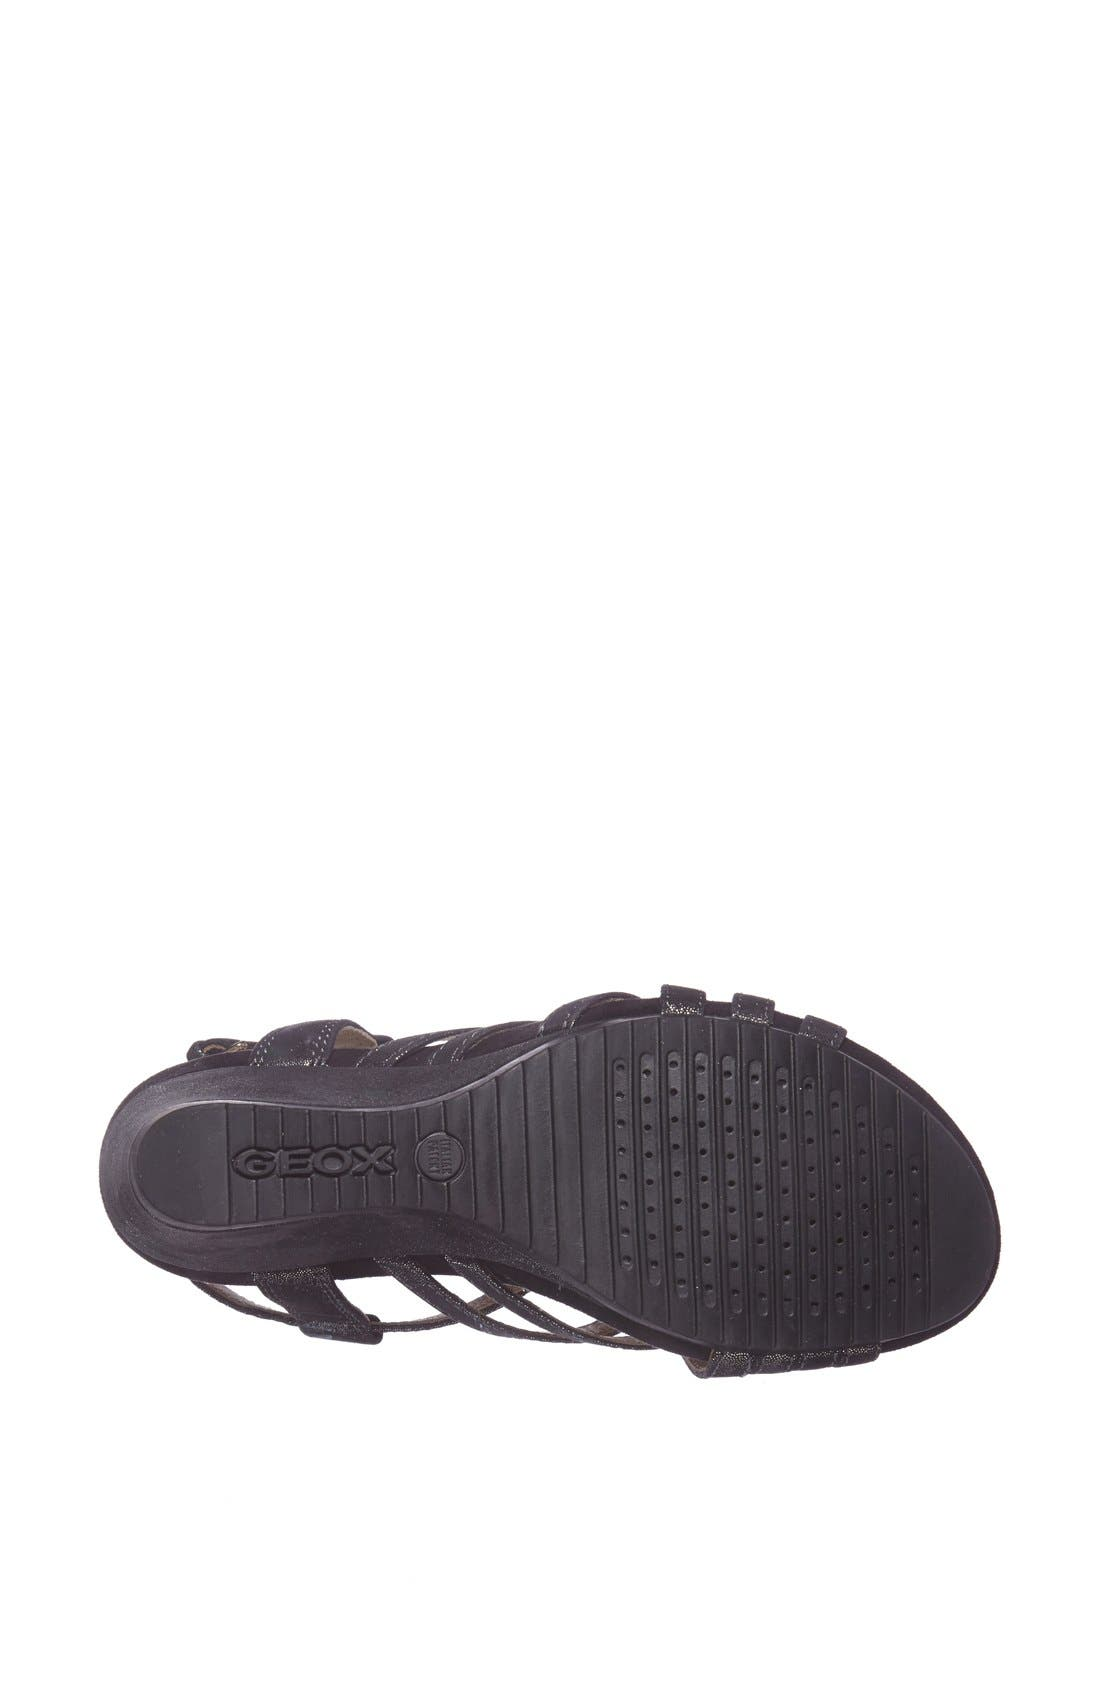 Alternate Image 4  - Geox 'Roxy' Metallic Leather Sandal (Women)